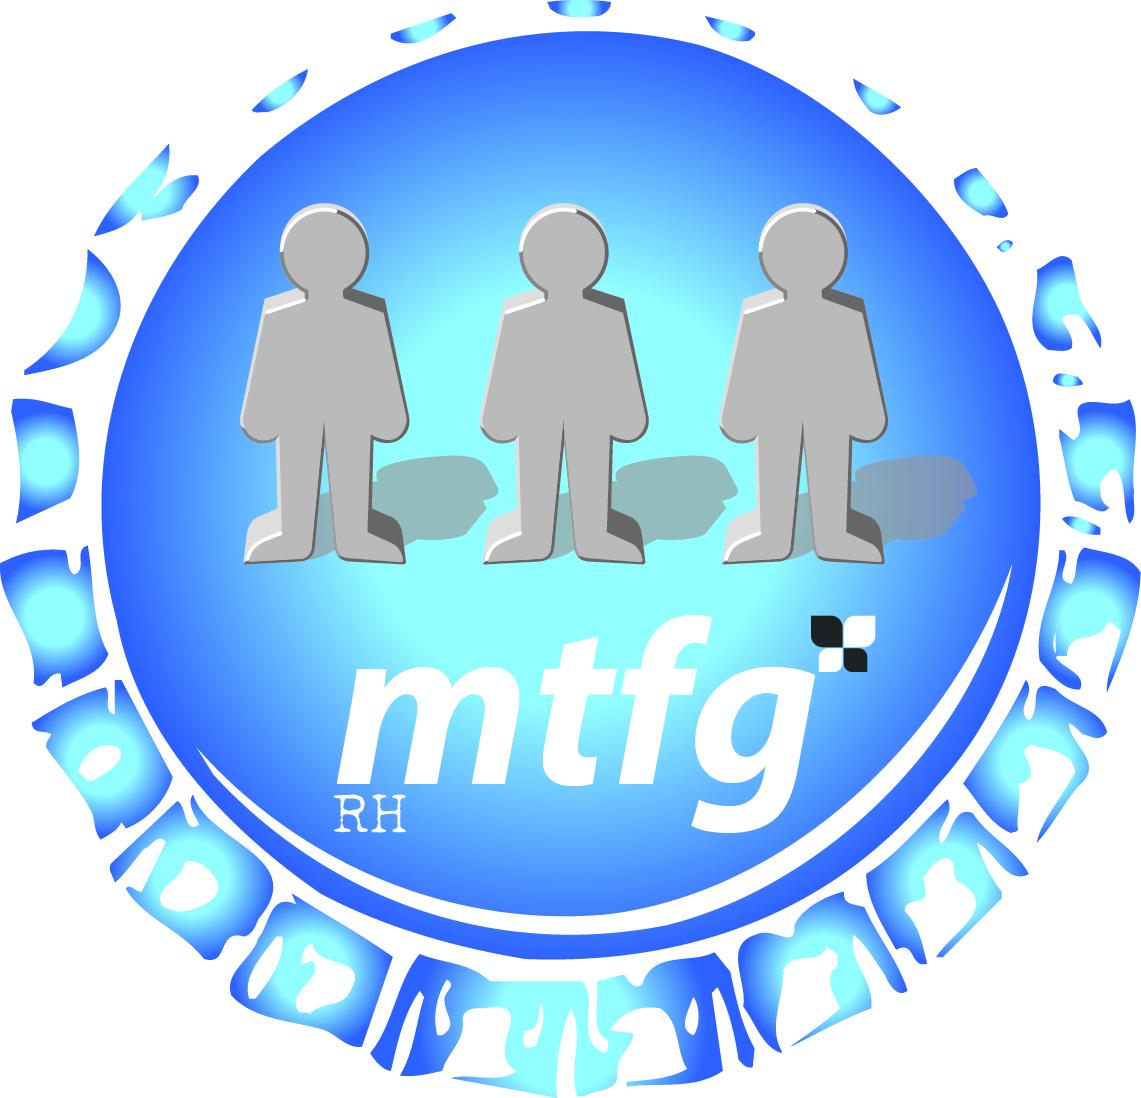 MTFG Ressources humaines